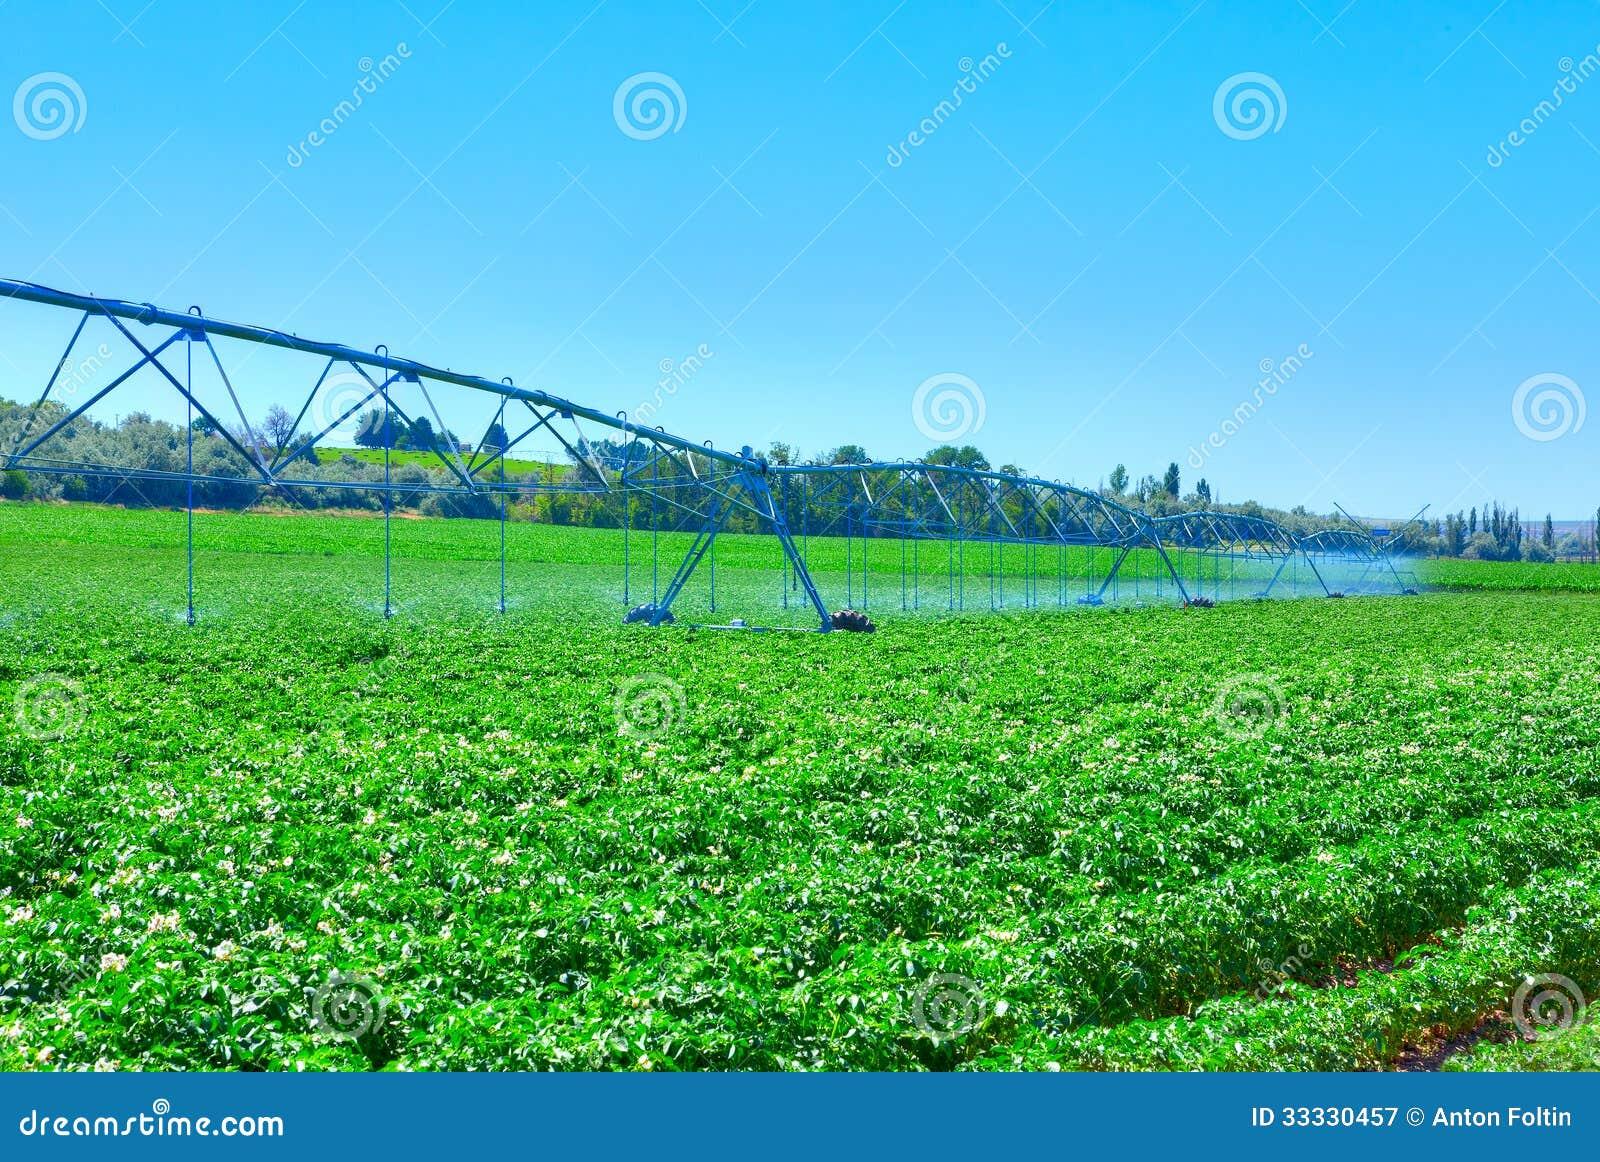 Farm Royalty Free Stock Photography  Image 33330457